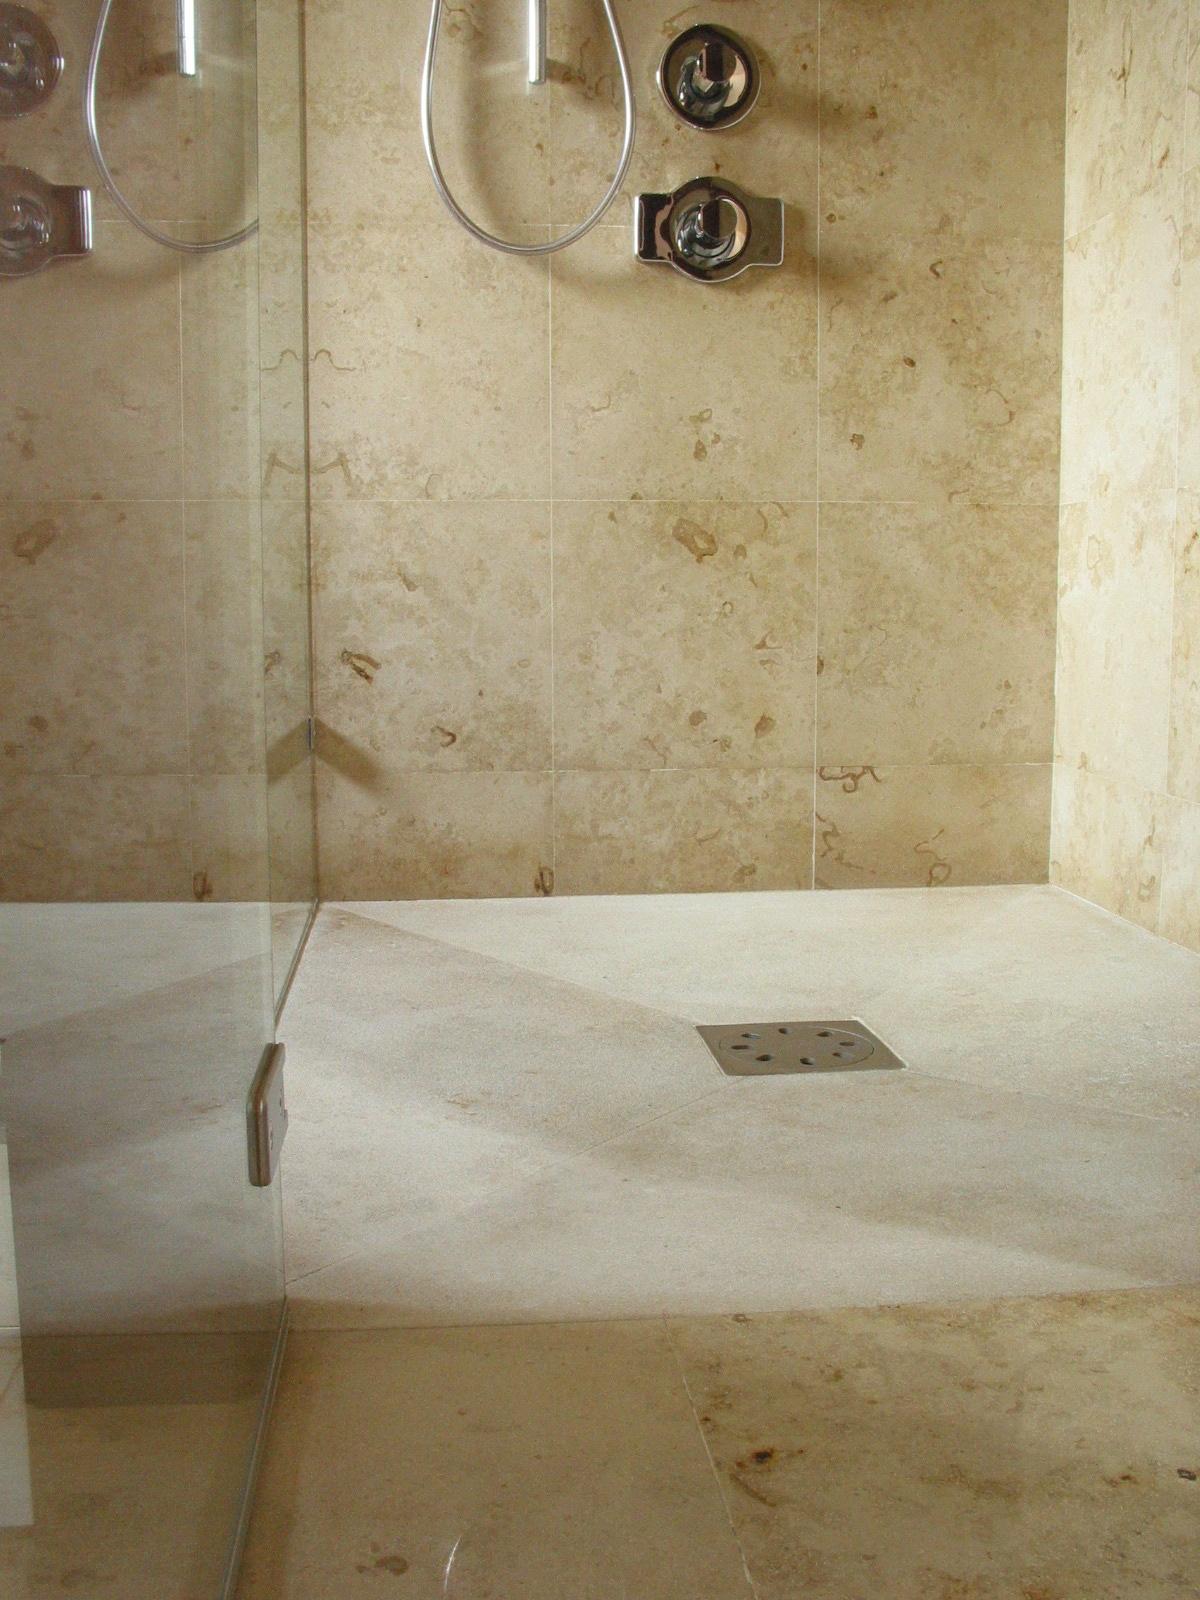 Platos de ducha la piedra natural - Plato ducha piedra natural ...